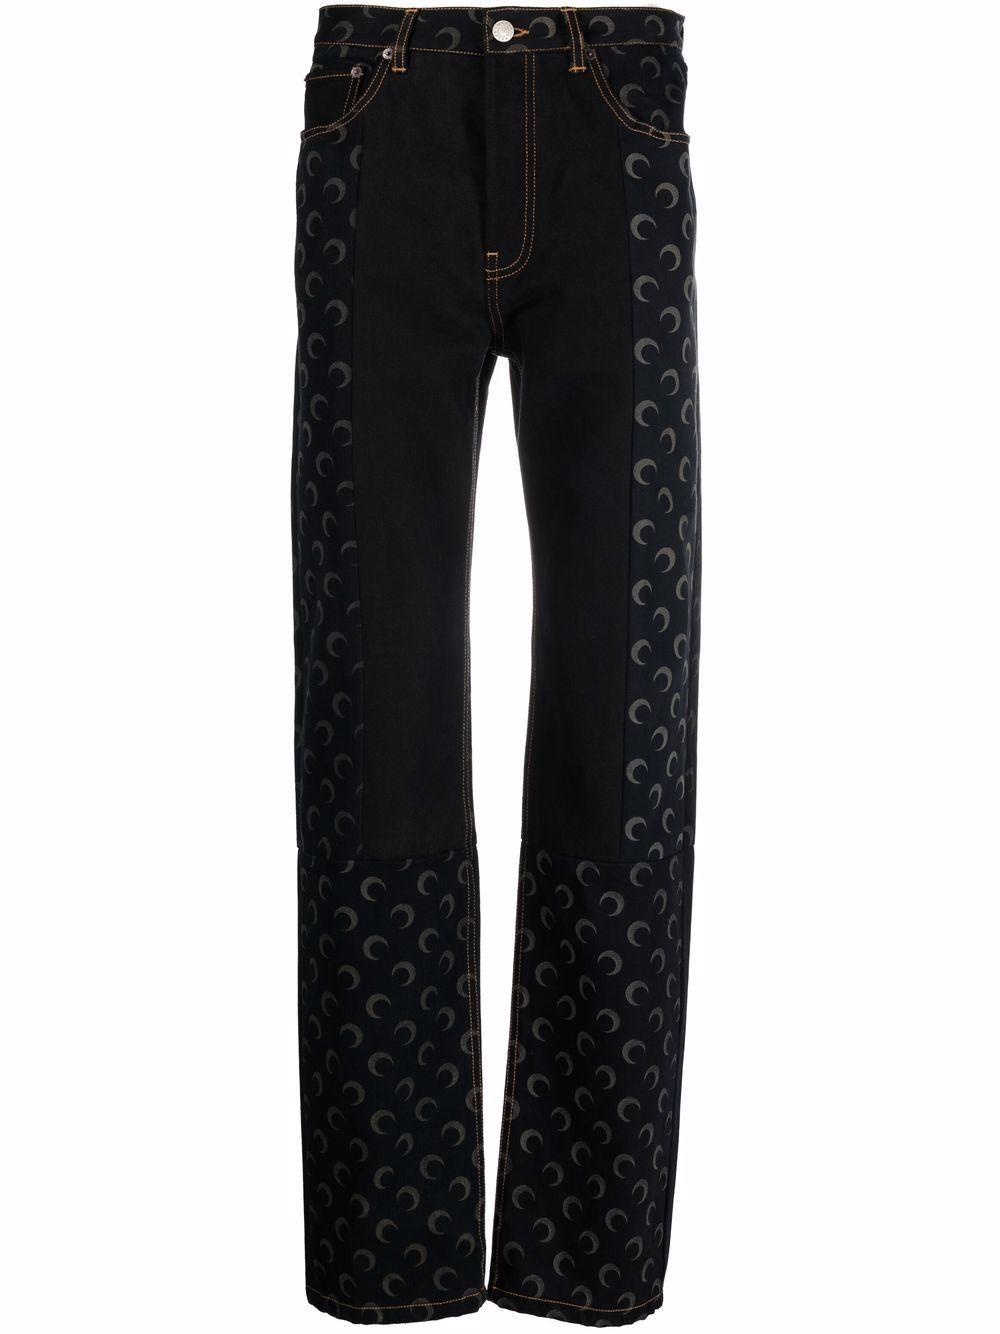 Jeans stampa lune in cotone